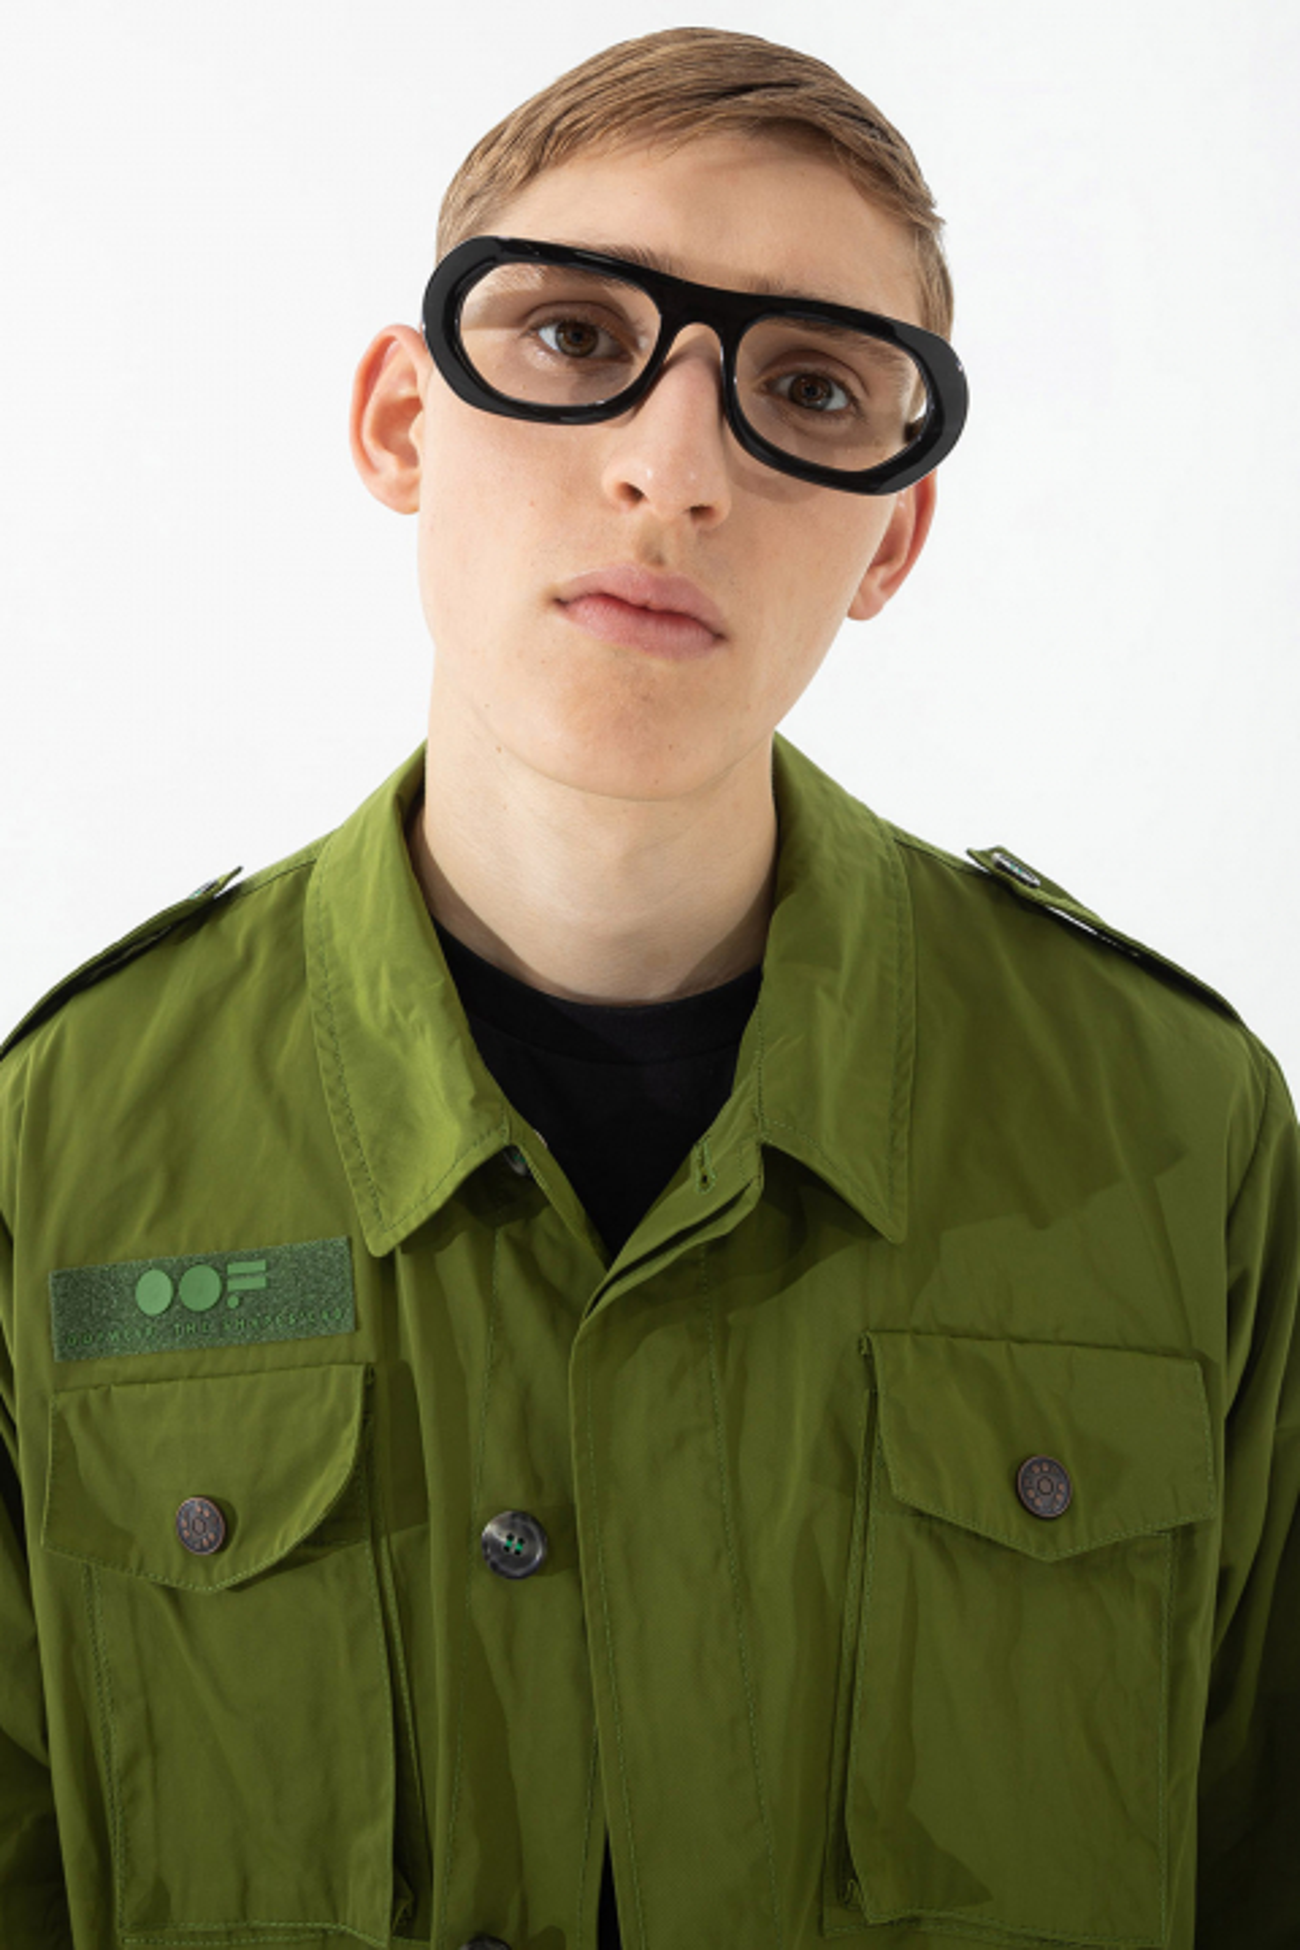 Men's short safari jacket in olive military style memory